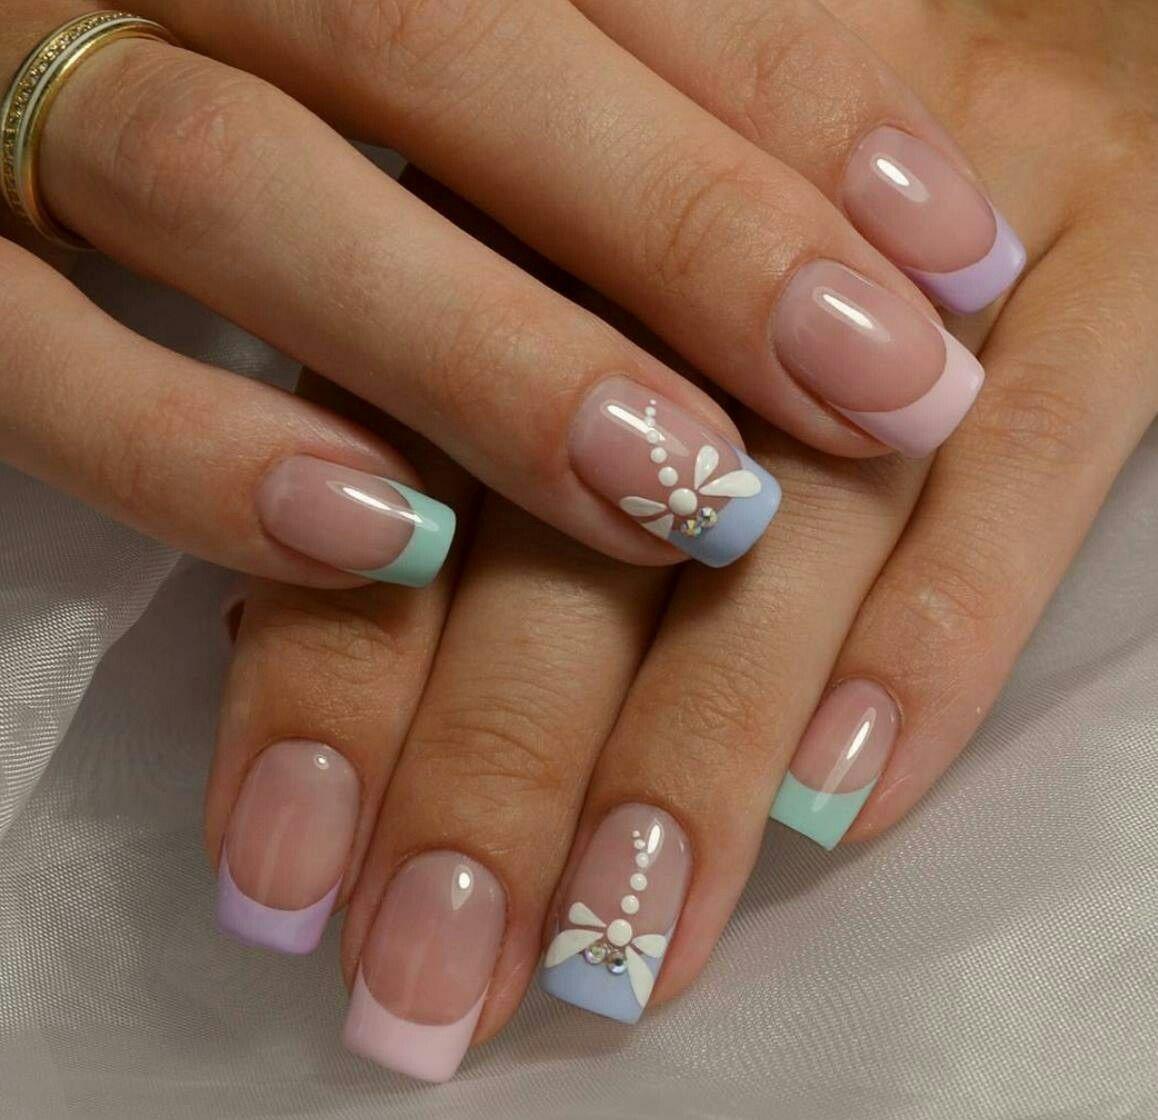 Pin by Kristi Tate on nails | Pinterest | Nails, Nail Art ...